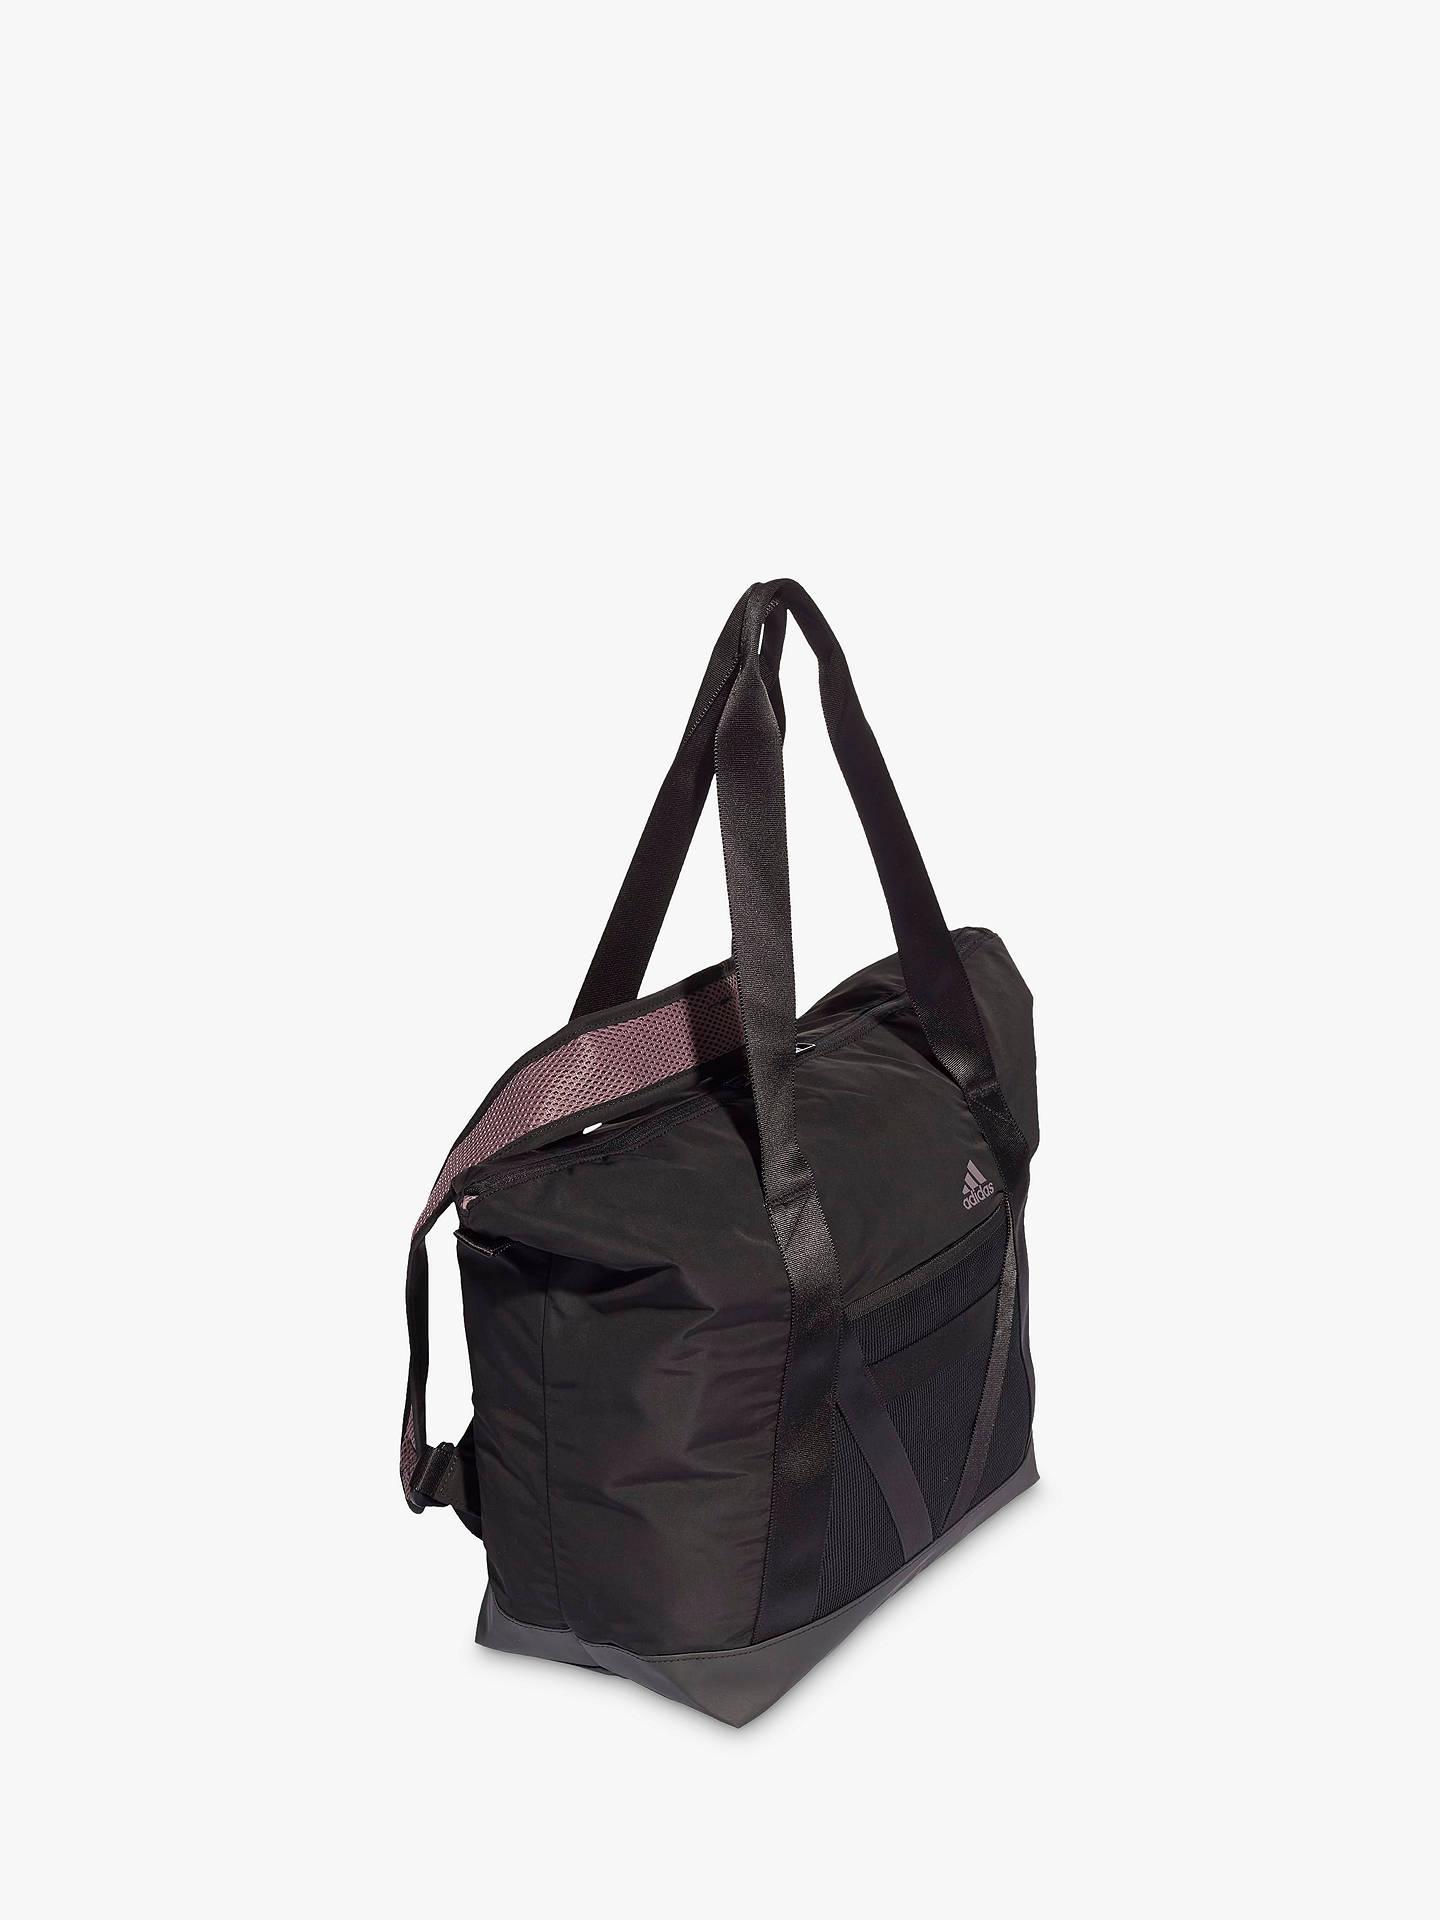 Expresión Se asemeja difícil  adidas ID Tote Bag, Black at John Lewis & Partners